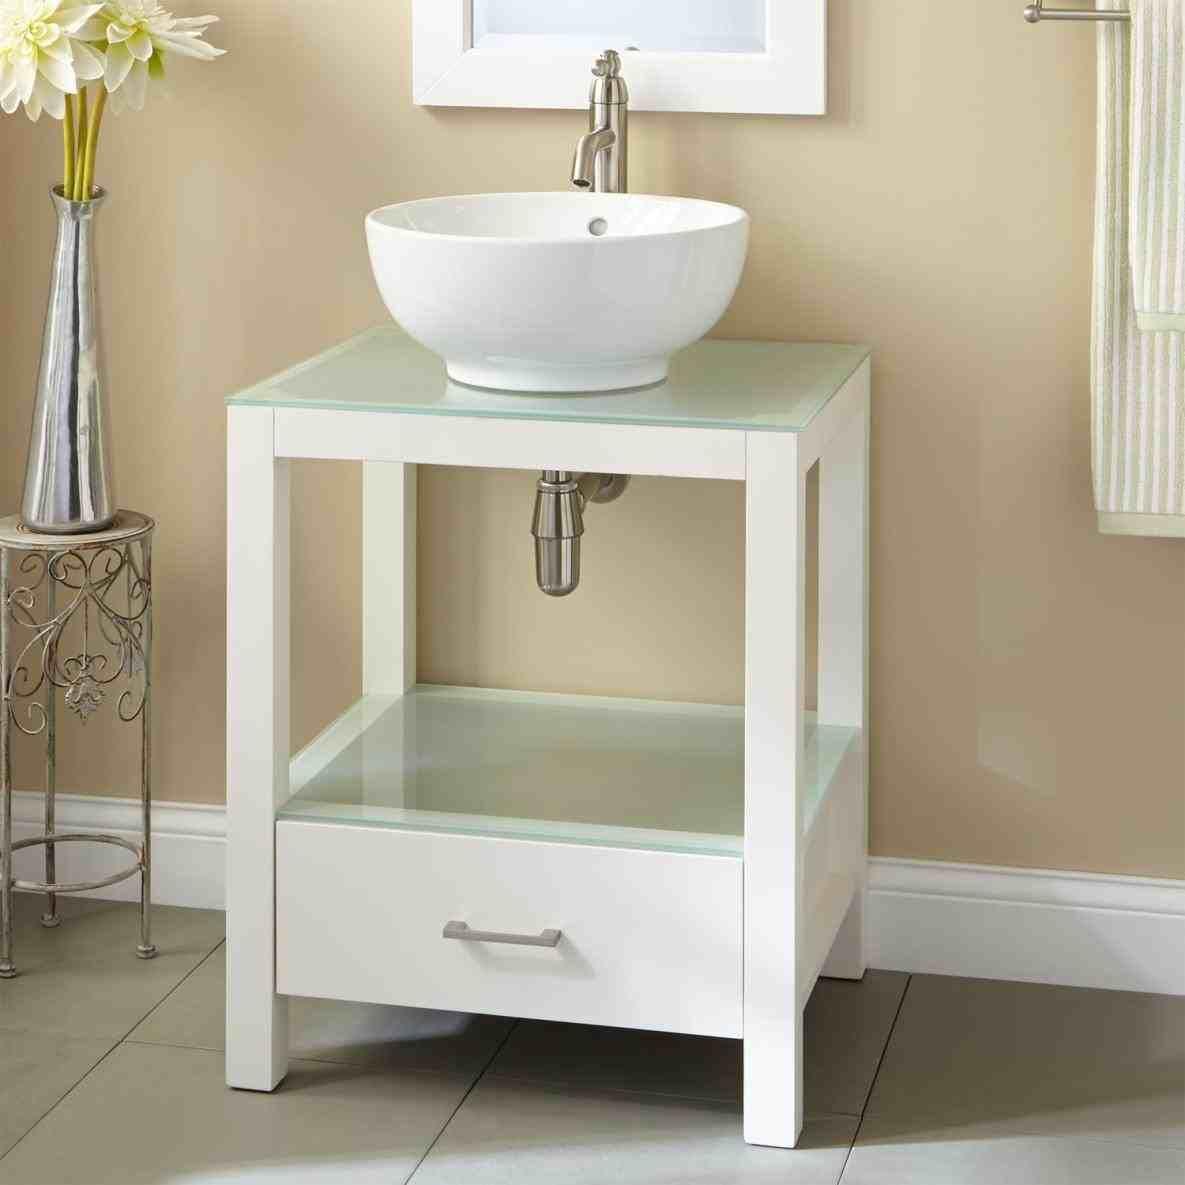 small bathroom tables | Cheap bathroom vanities, Bathroom ...